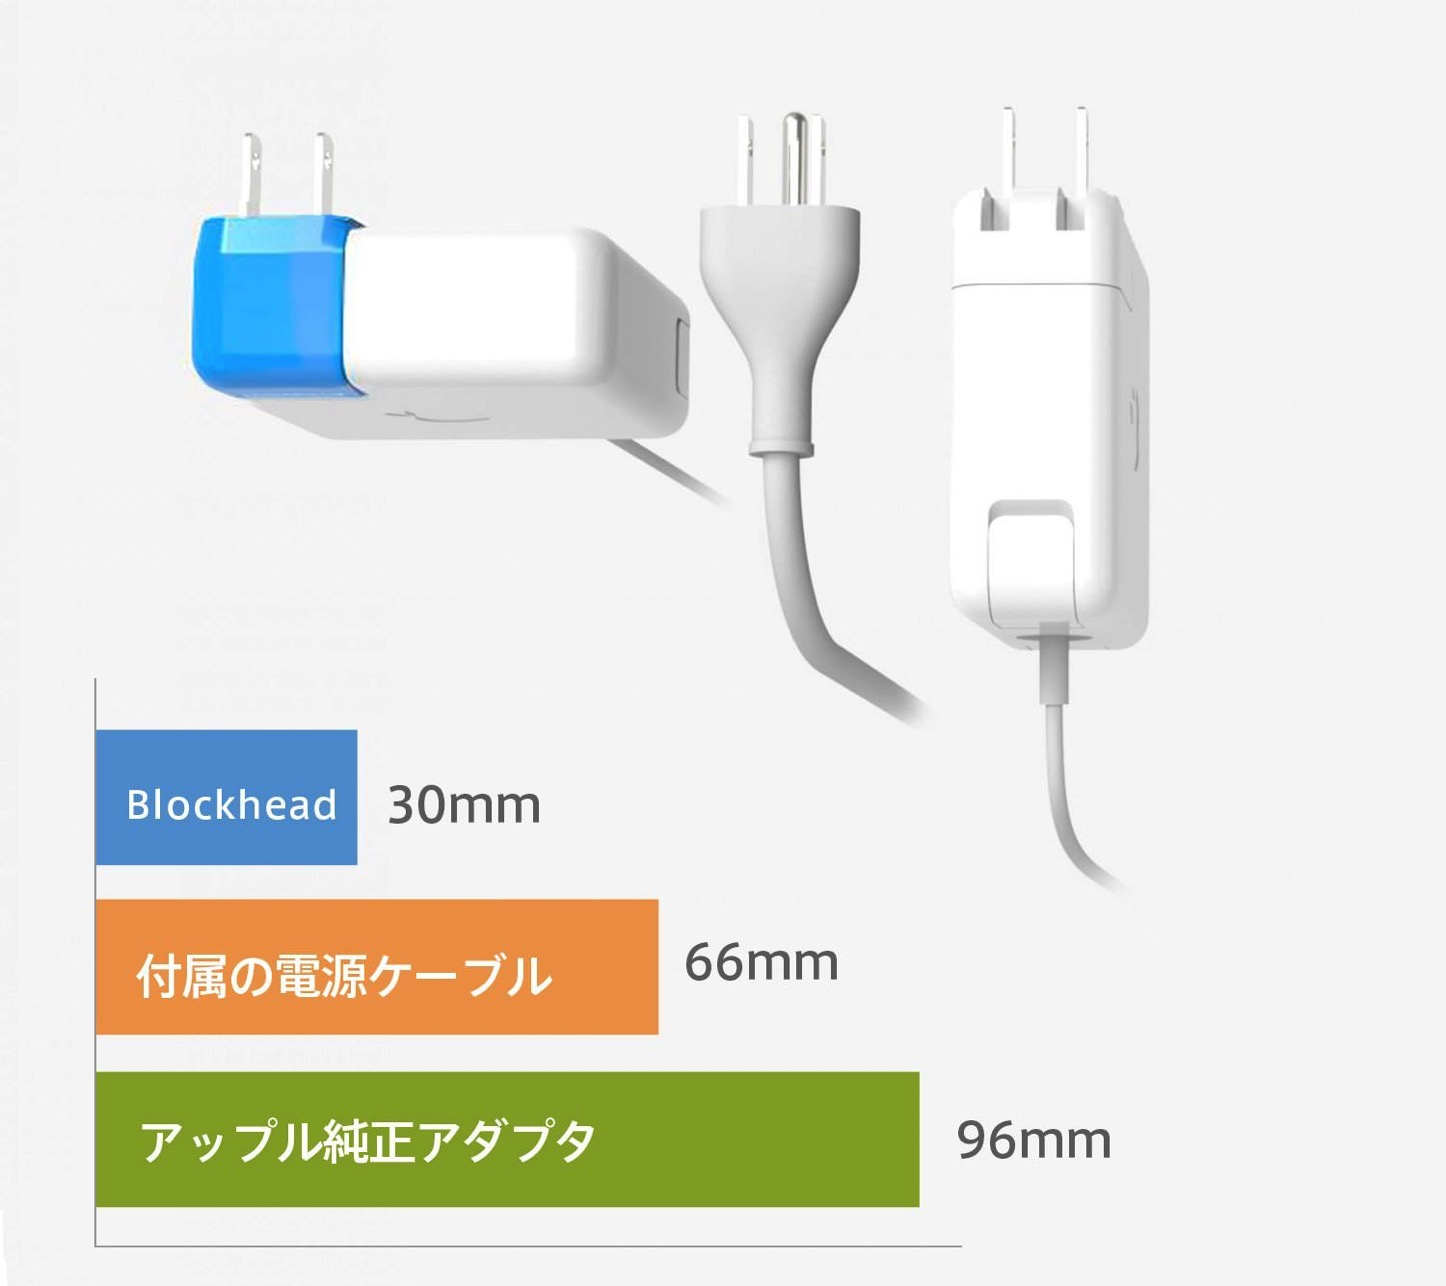 Ten-One-Design-Blockhead-04.jpg